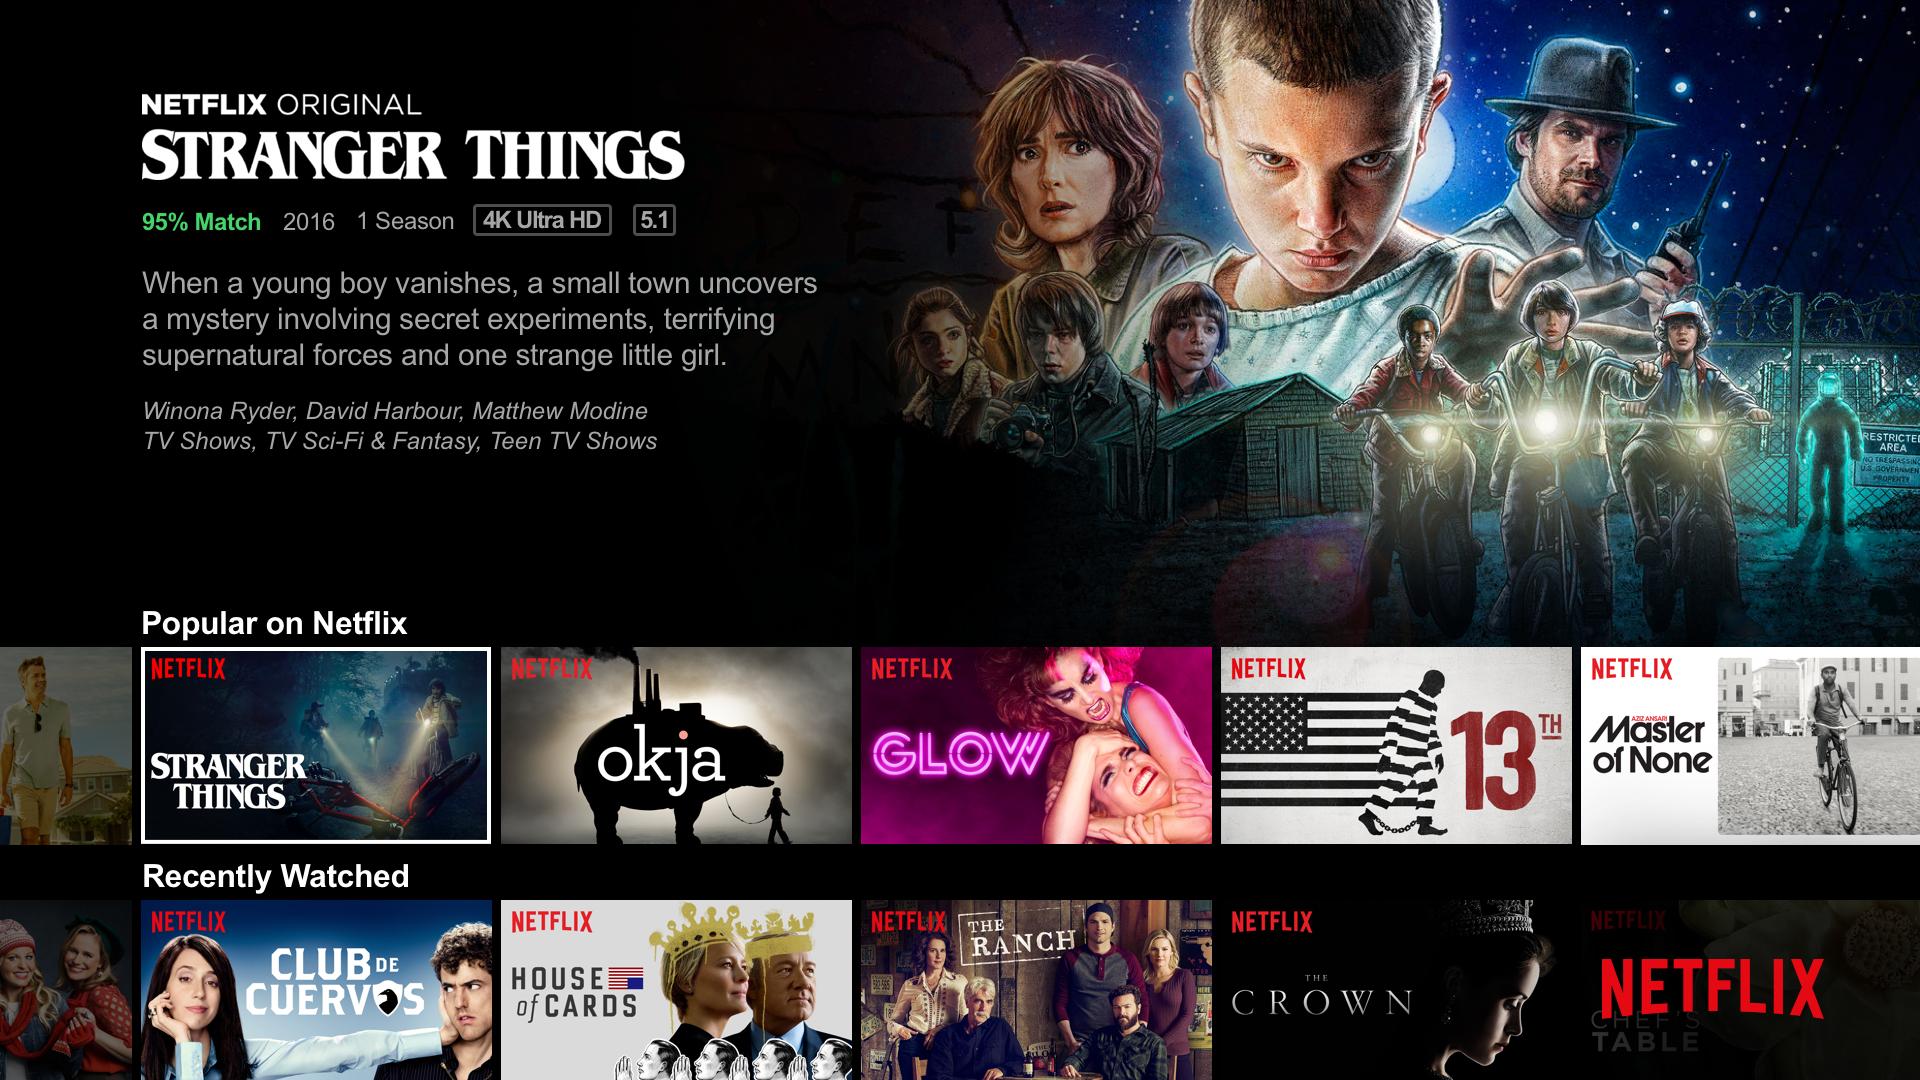 Netflix landing page featuring program Stranger Things.